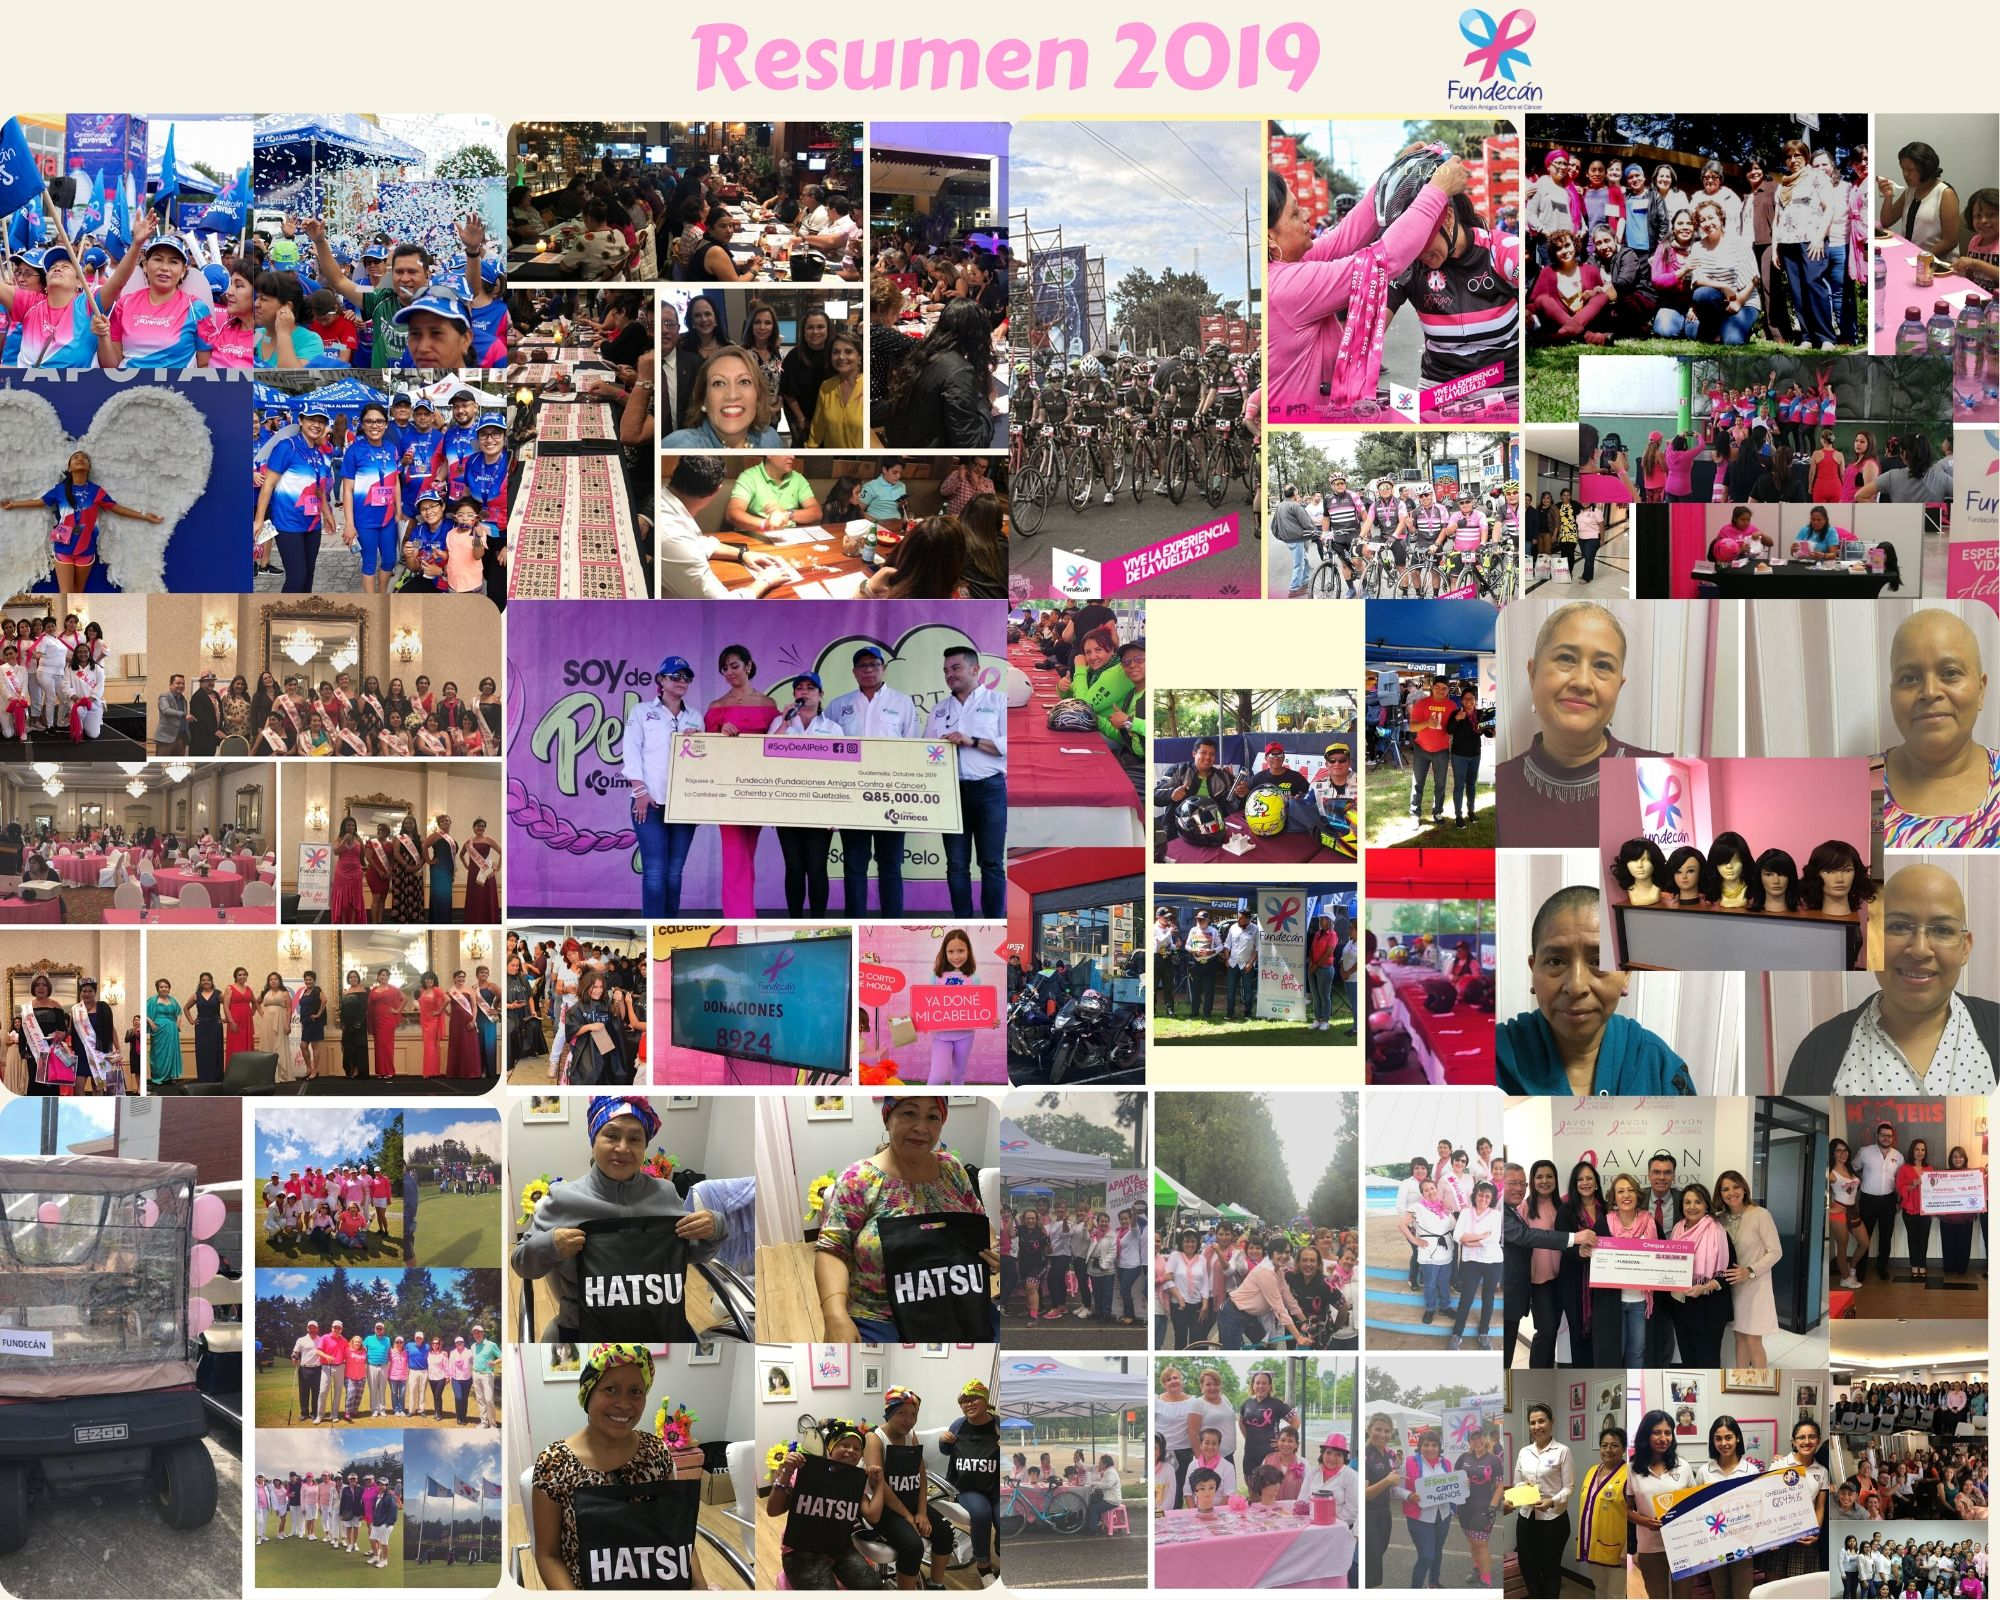 Collage - Resumen 2019